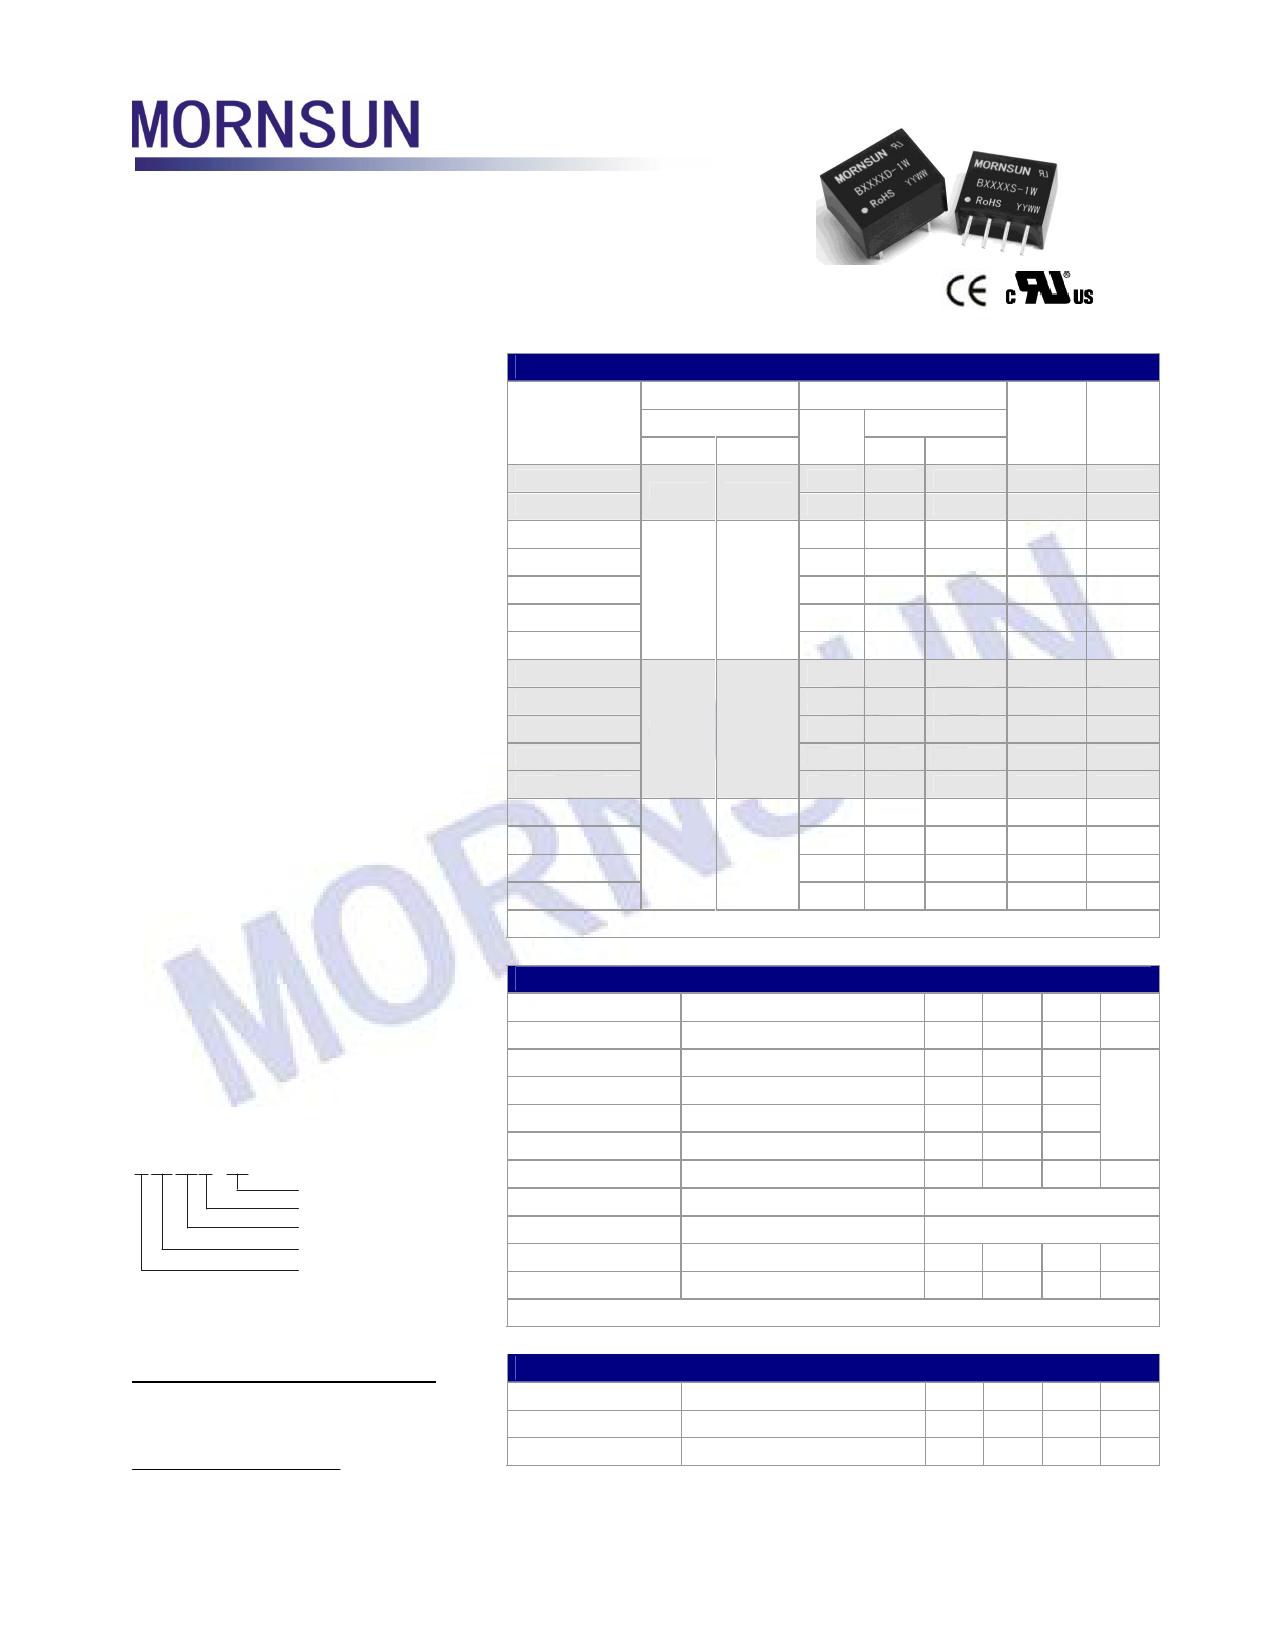 B0512D-1W datasheet